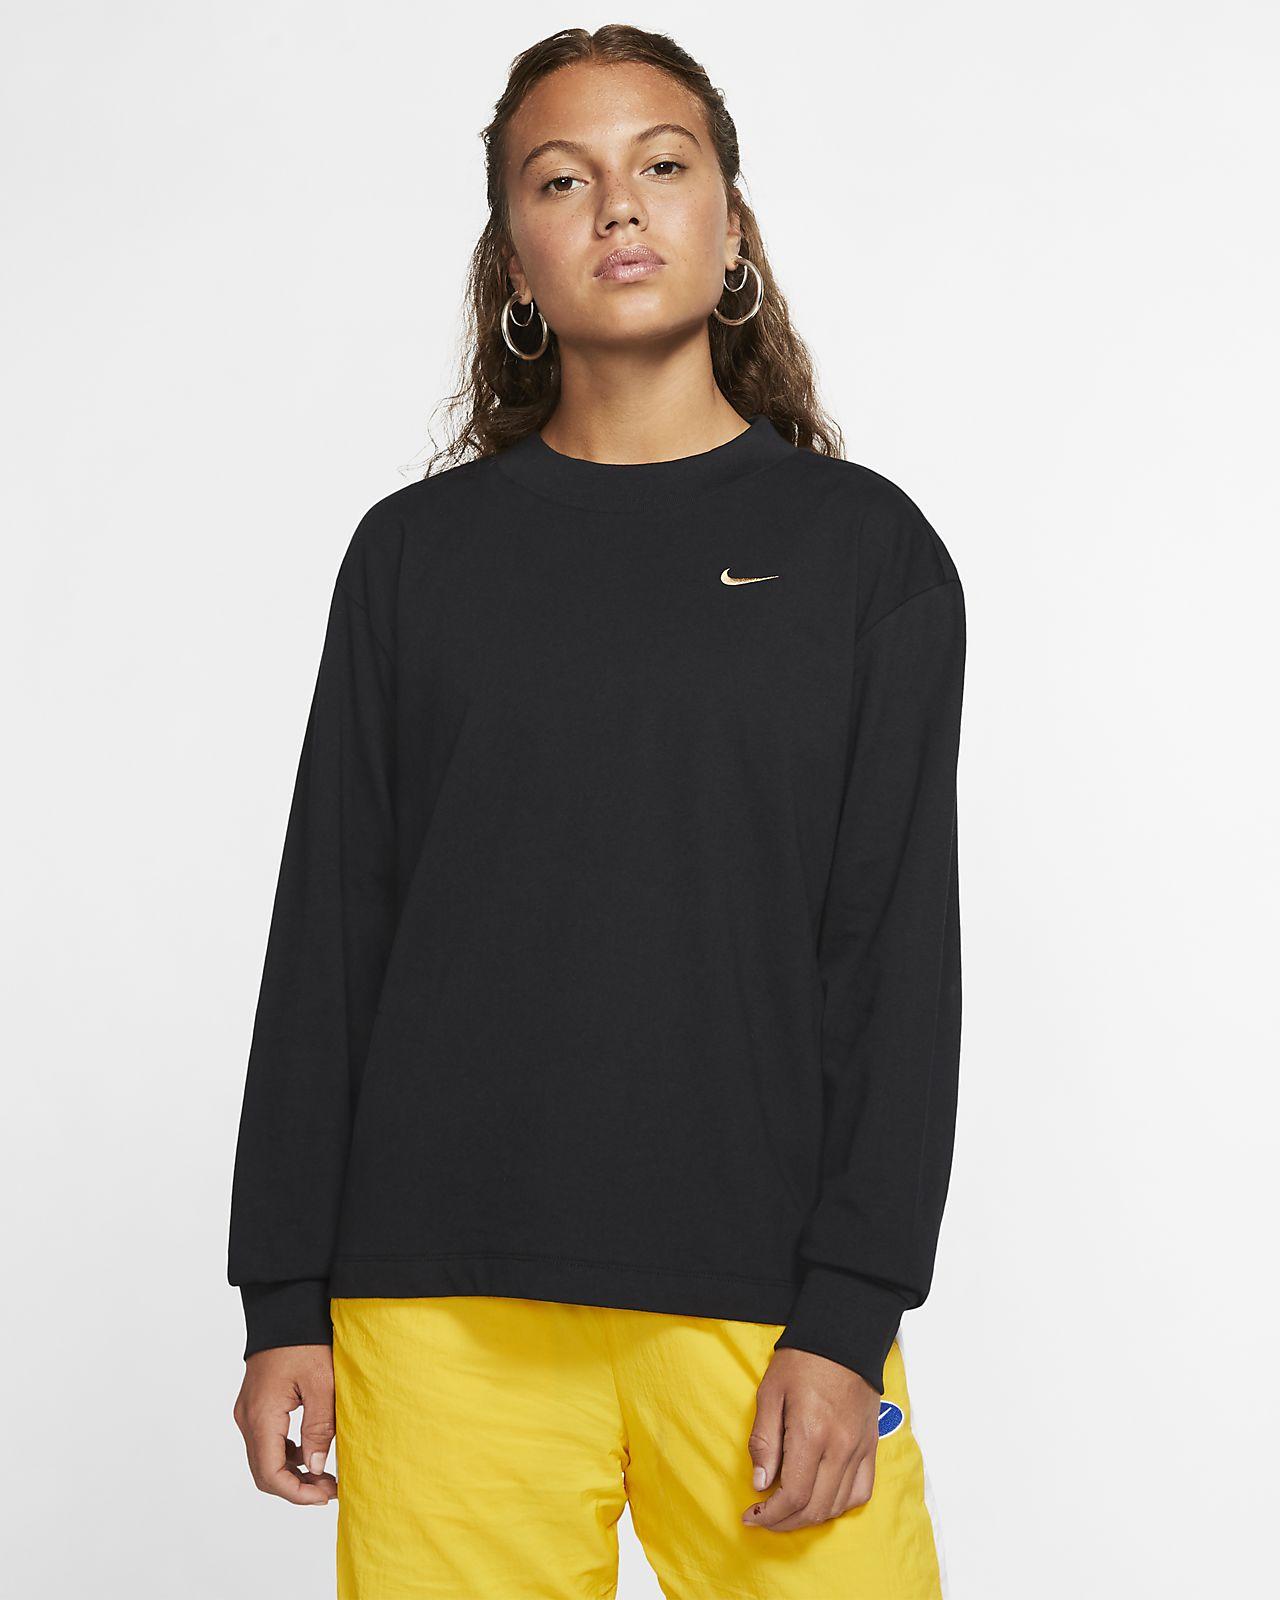 Nike Sportswear Essential langermet overdel til dame